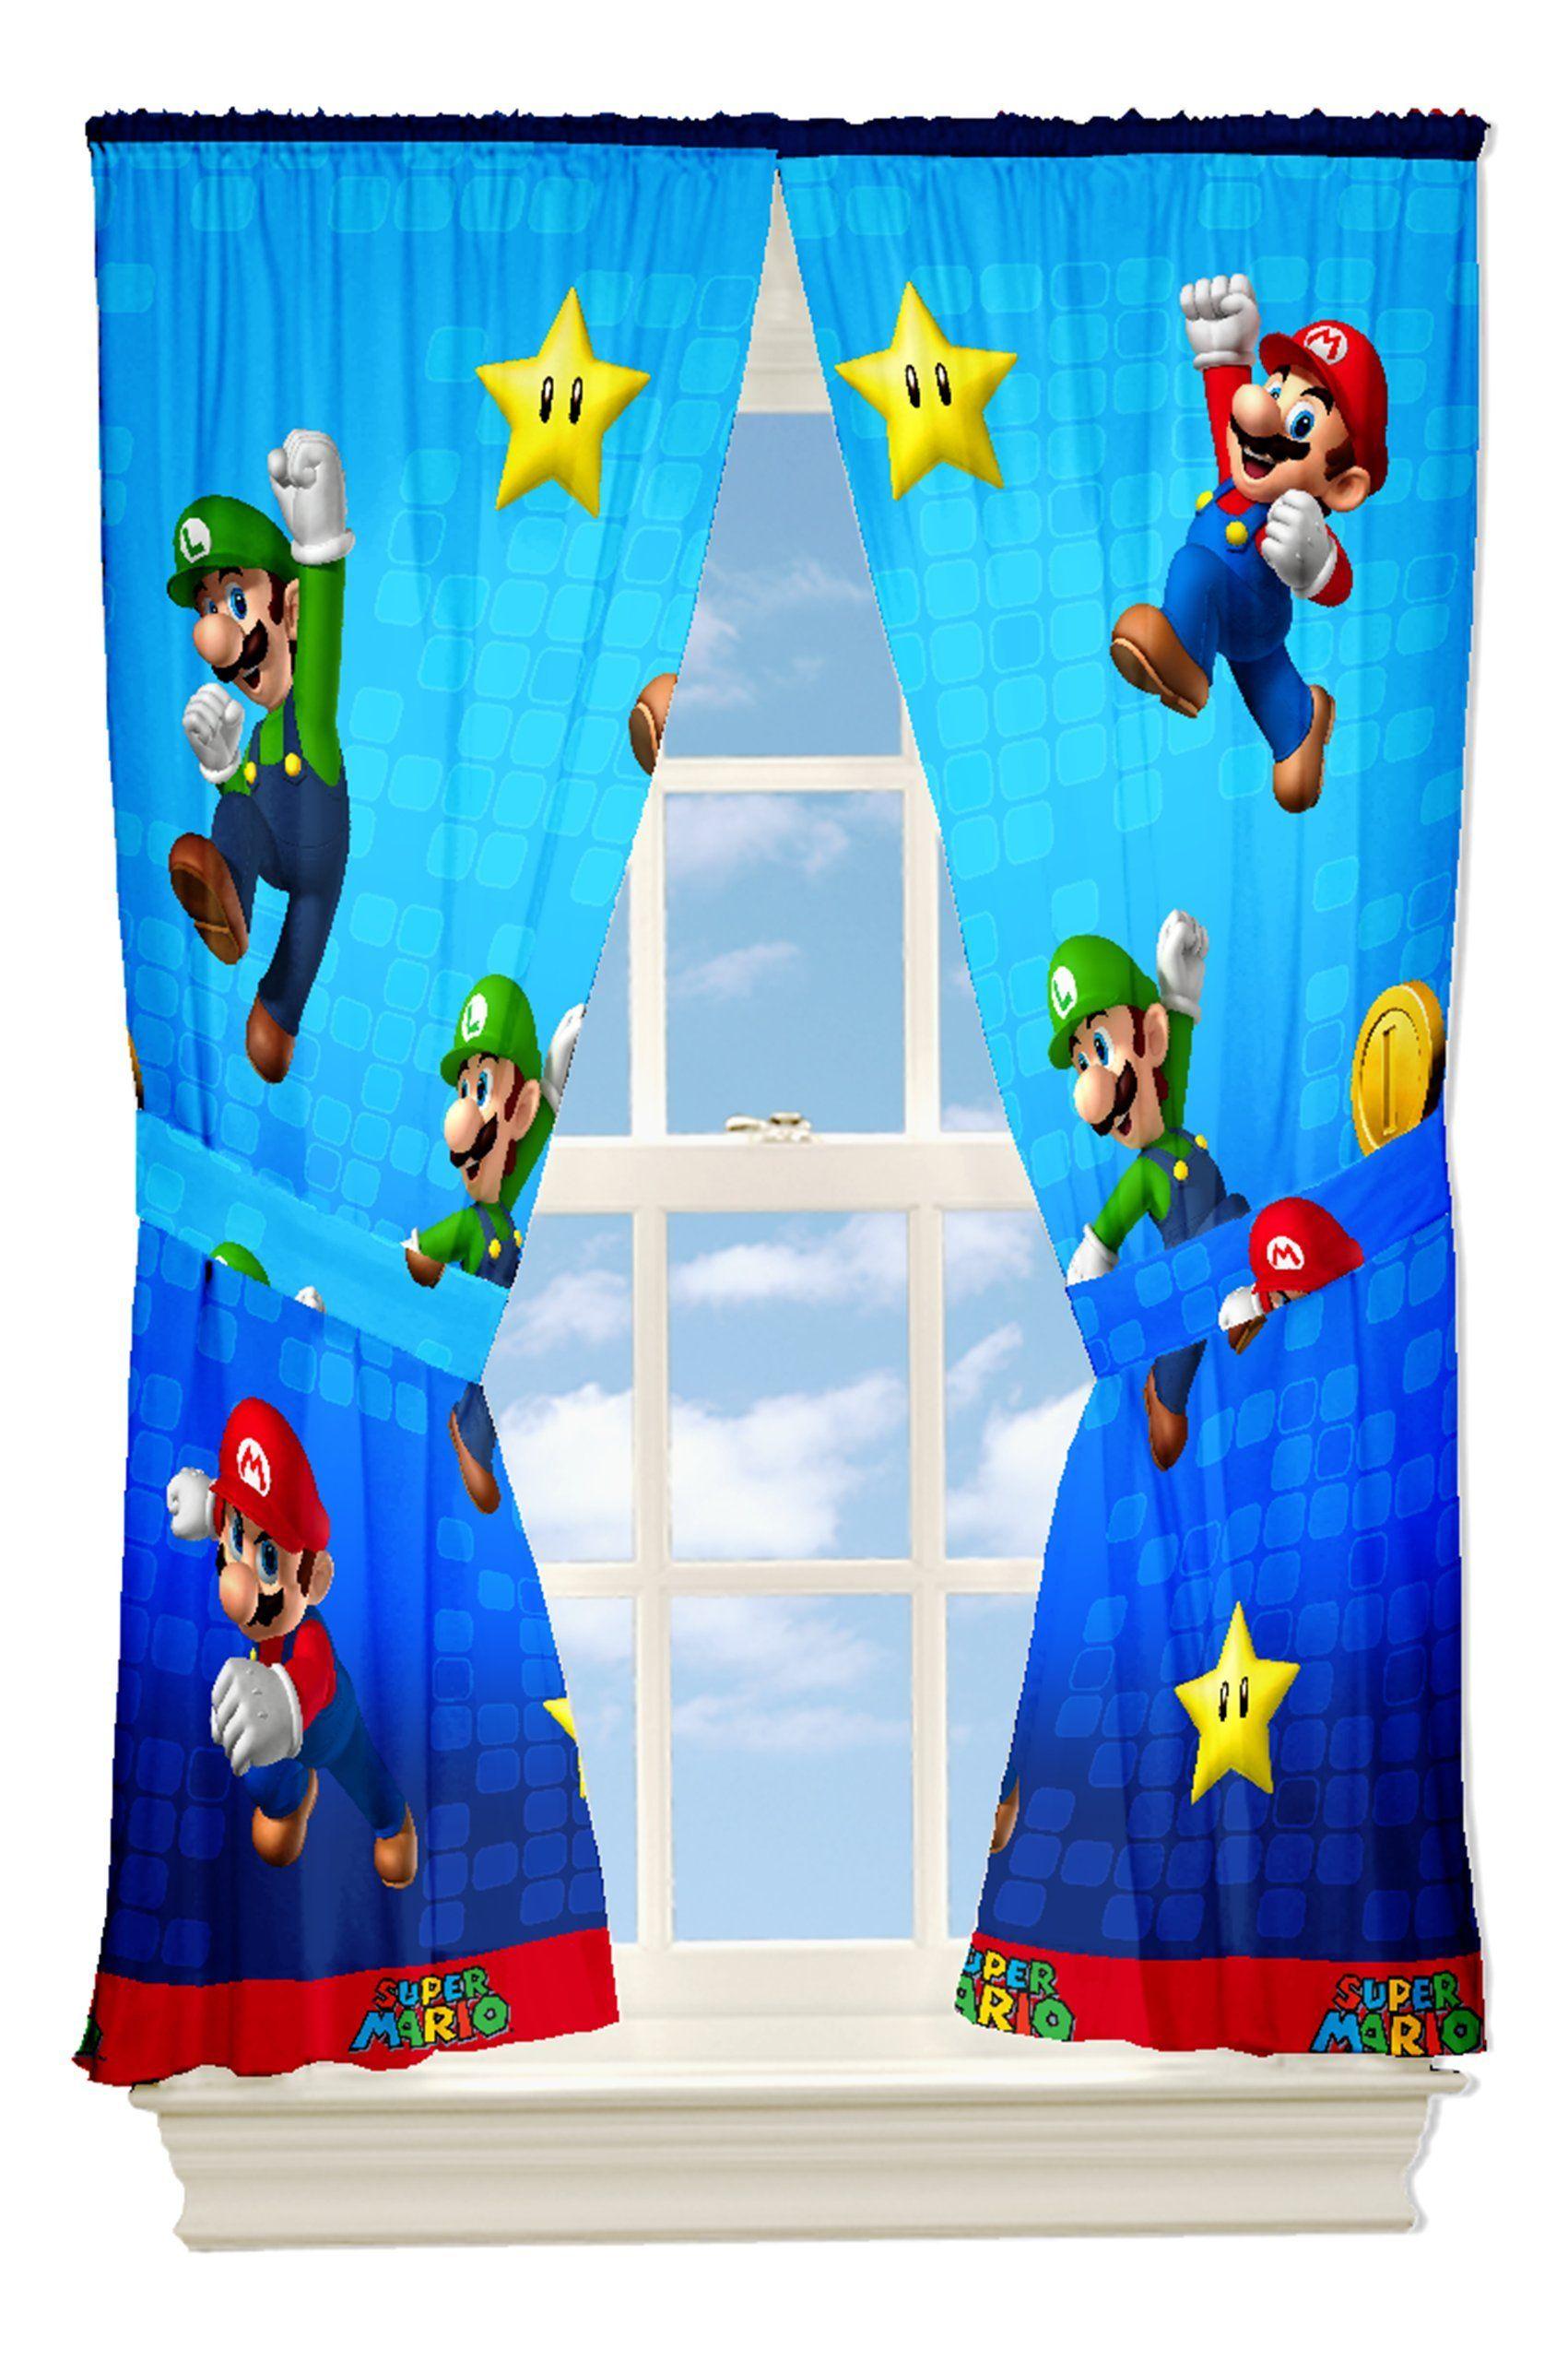 Nintendo Super Mario And Friends Drapes 82 By 63 Inch Mario Room Super Mario Video Game Decor